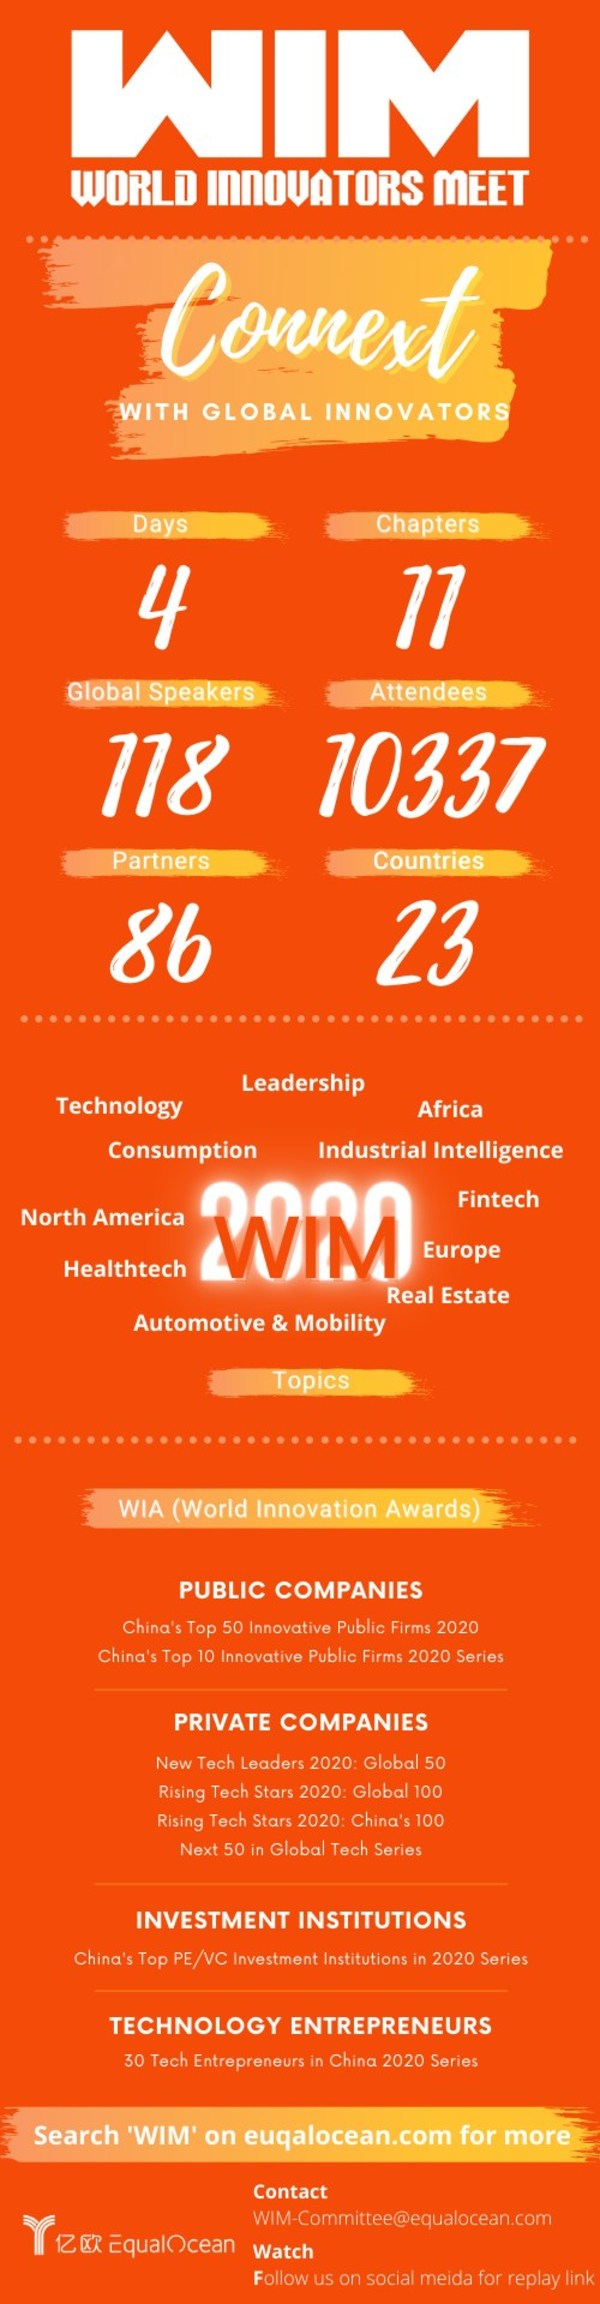 World Innovators Meet 2020